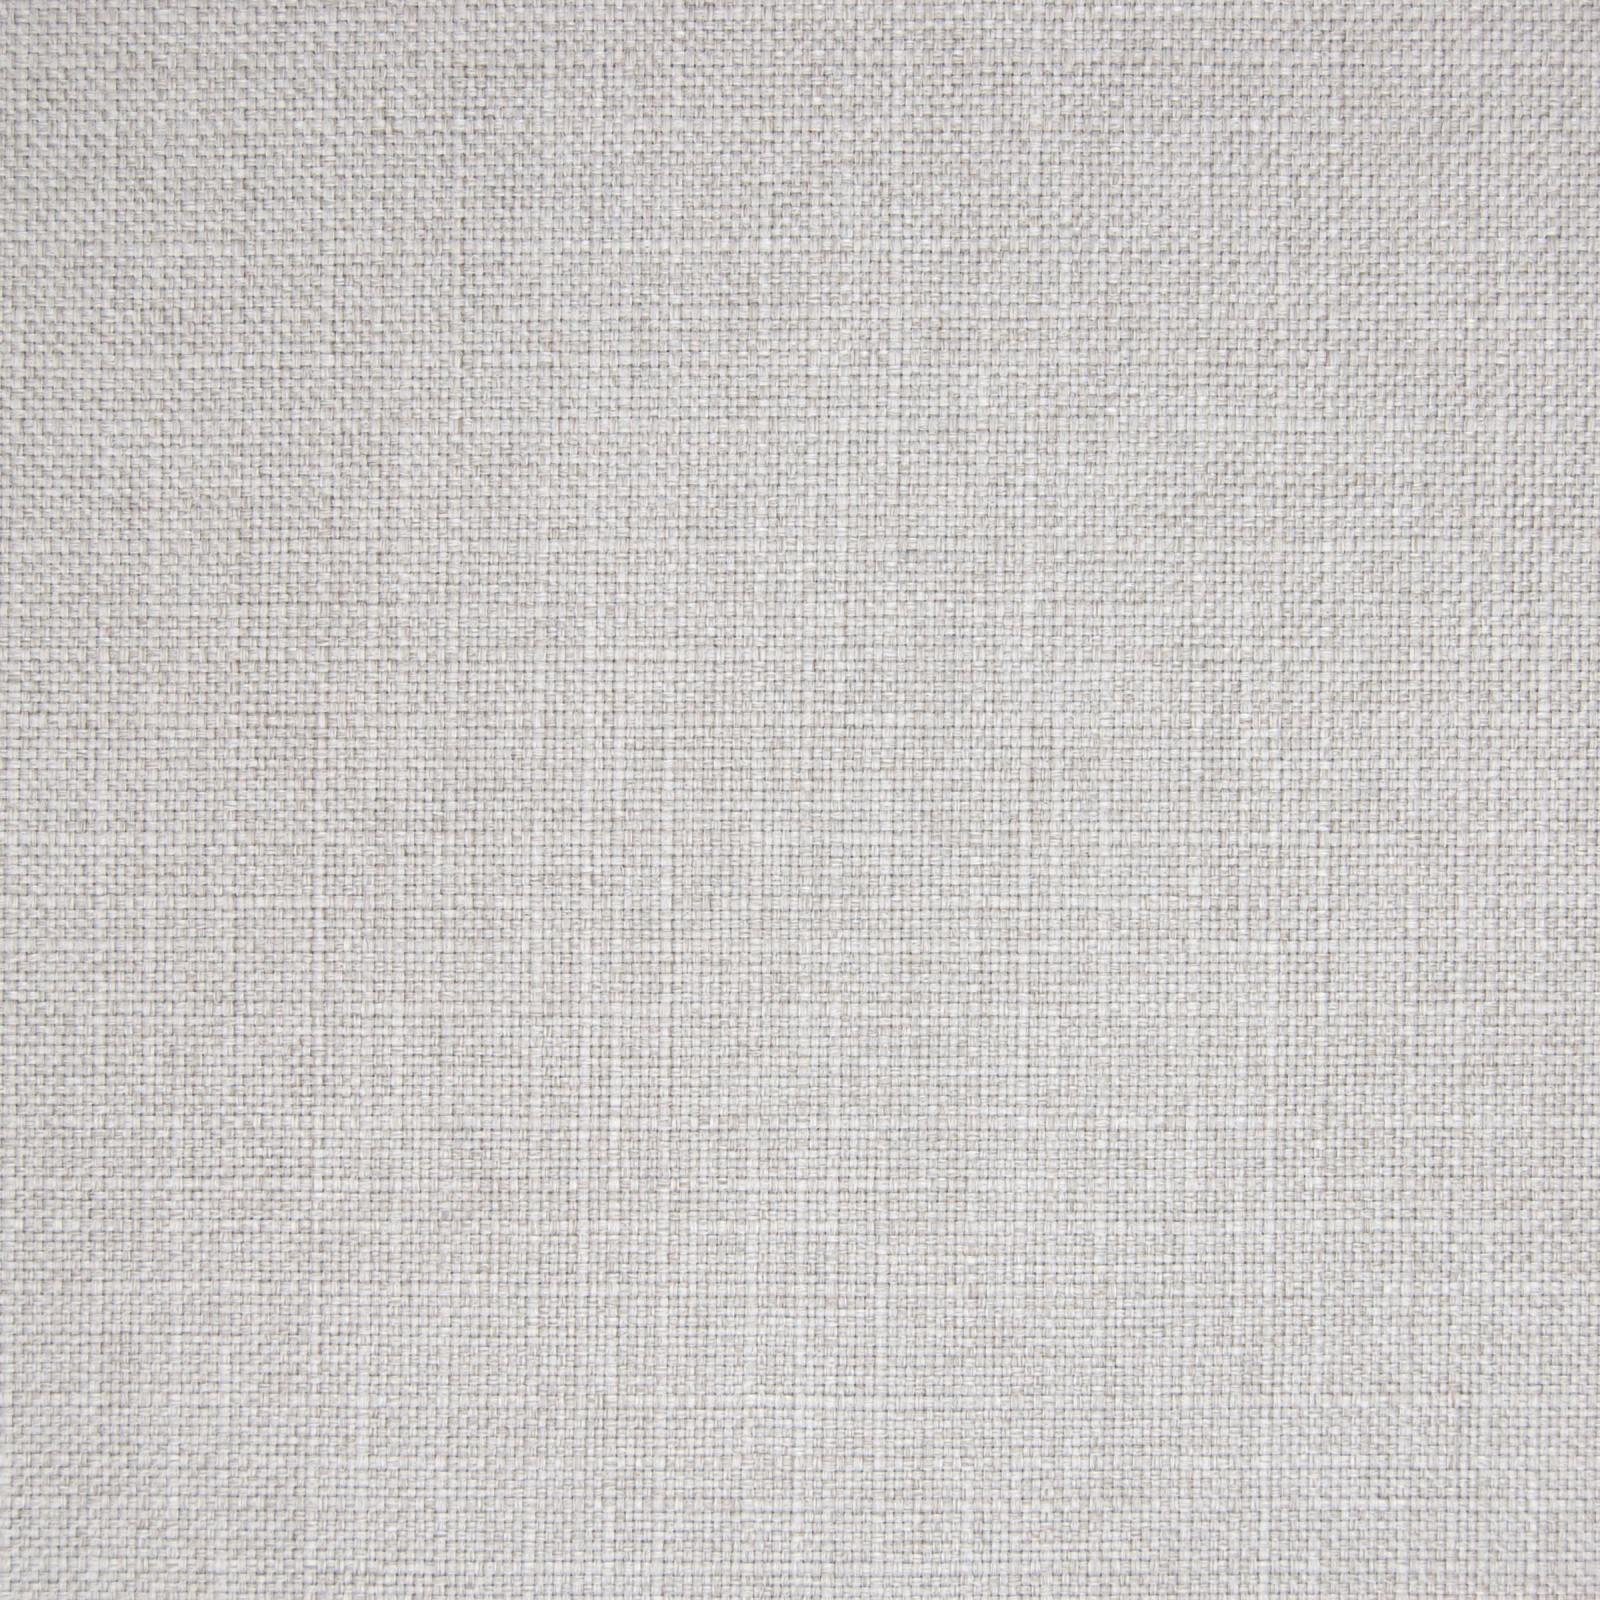 blue dot chairs dining leather uk b6766 linen   greenhouse fabrics